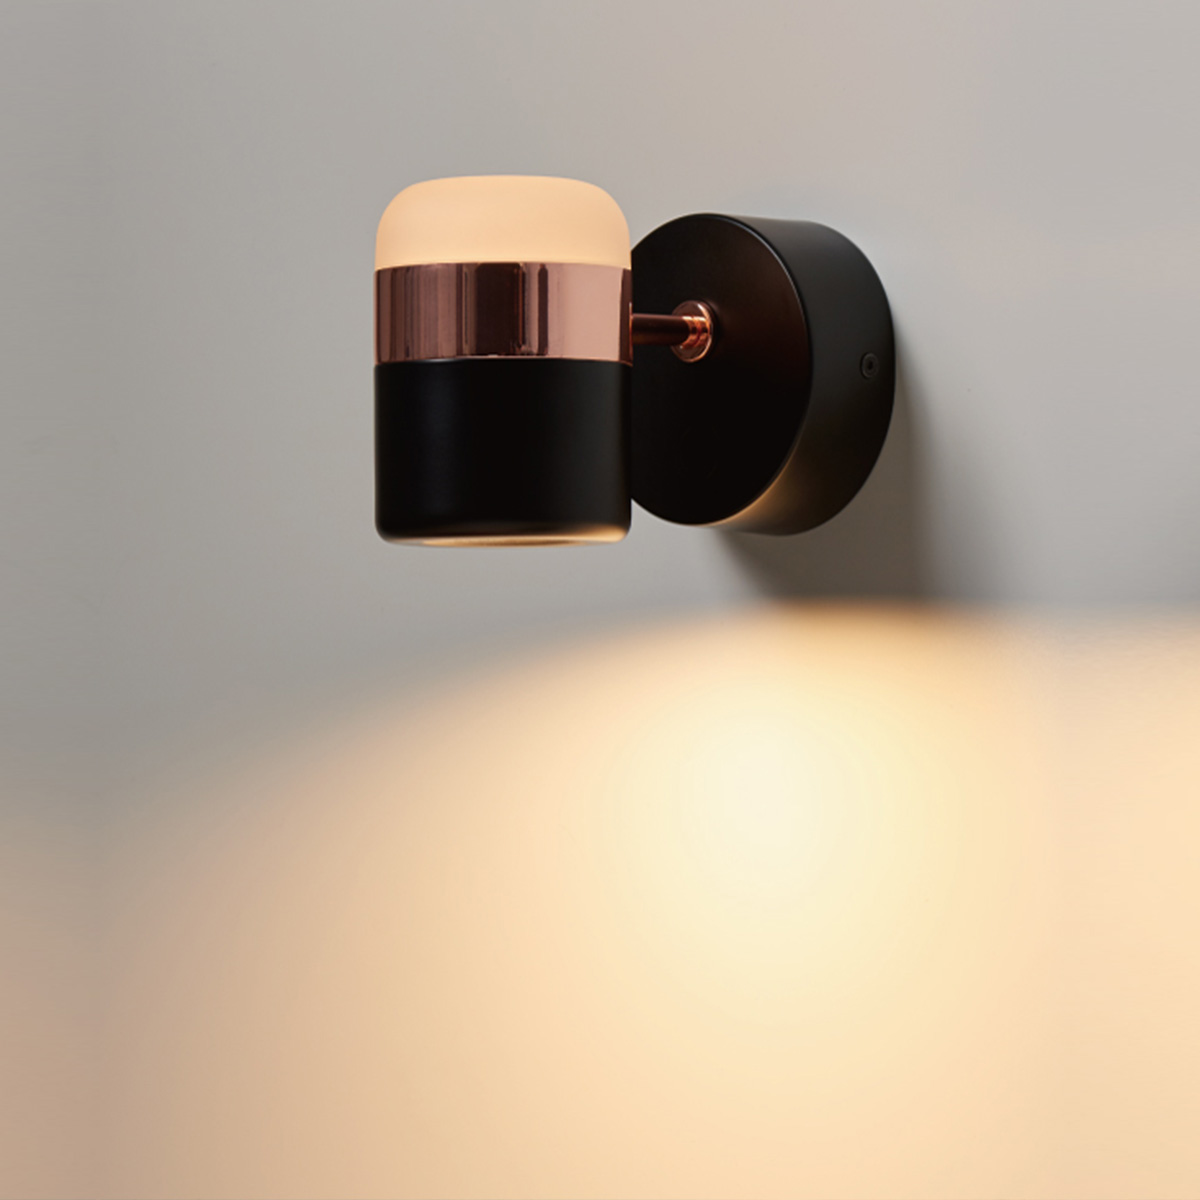 Zidna led lampa 1.0098 crno bakarna